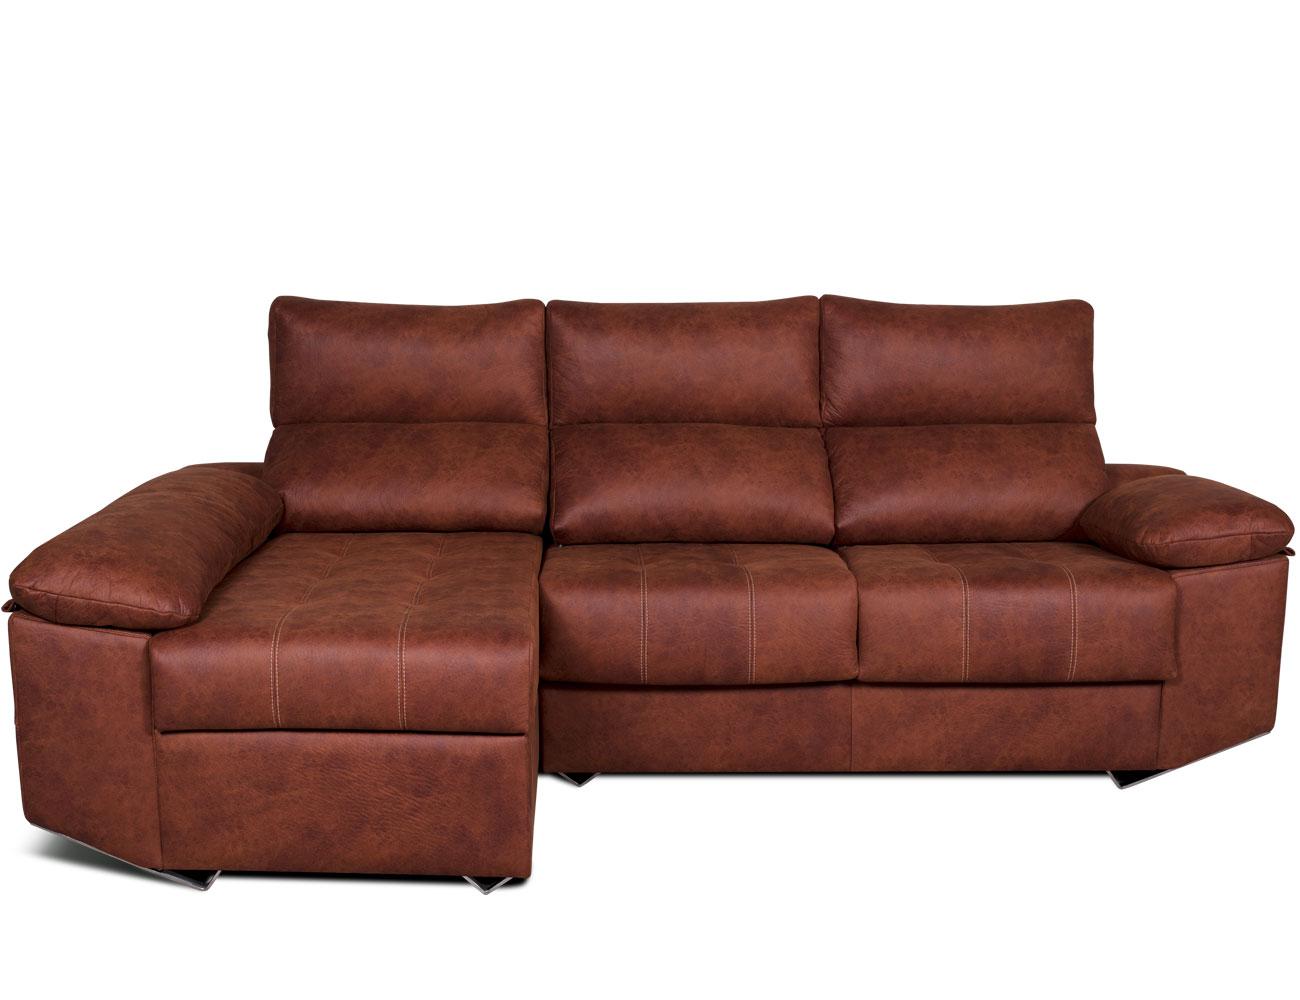 Sofa chaiselongue moderno patas forma tejido anti manchas 22